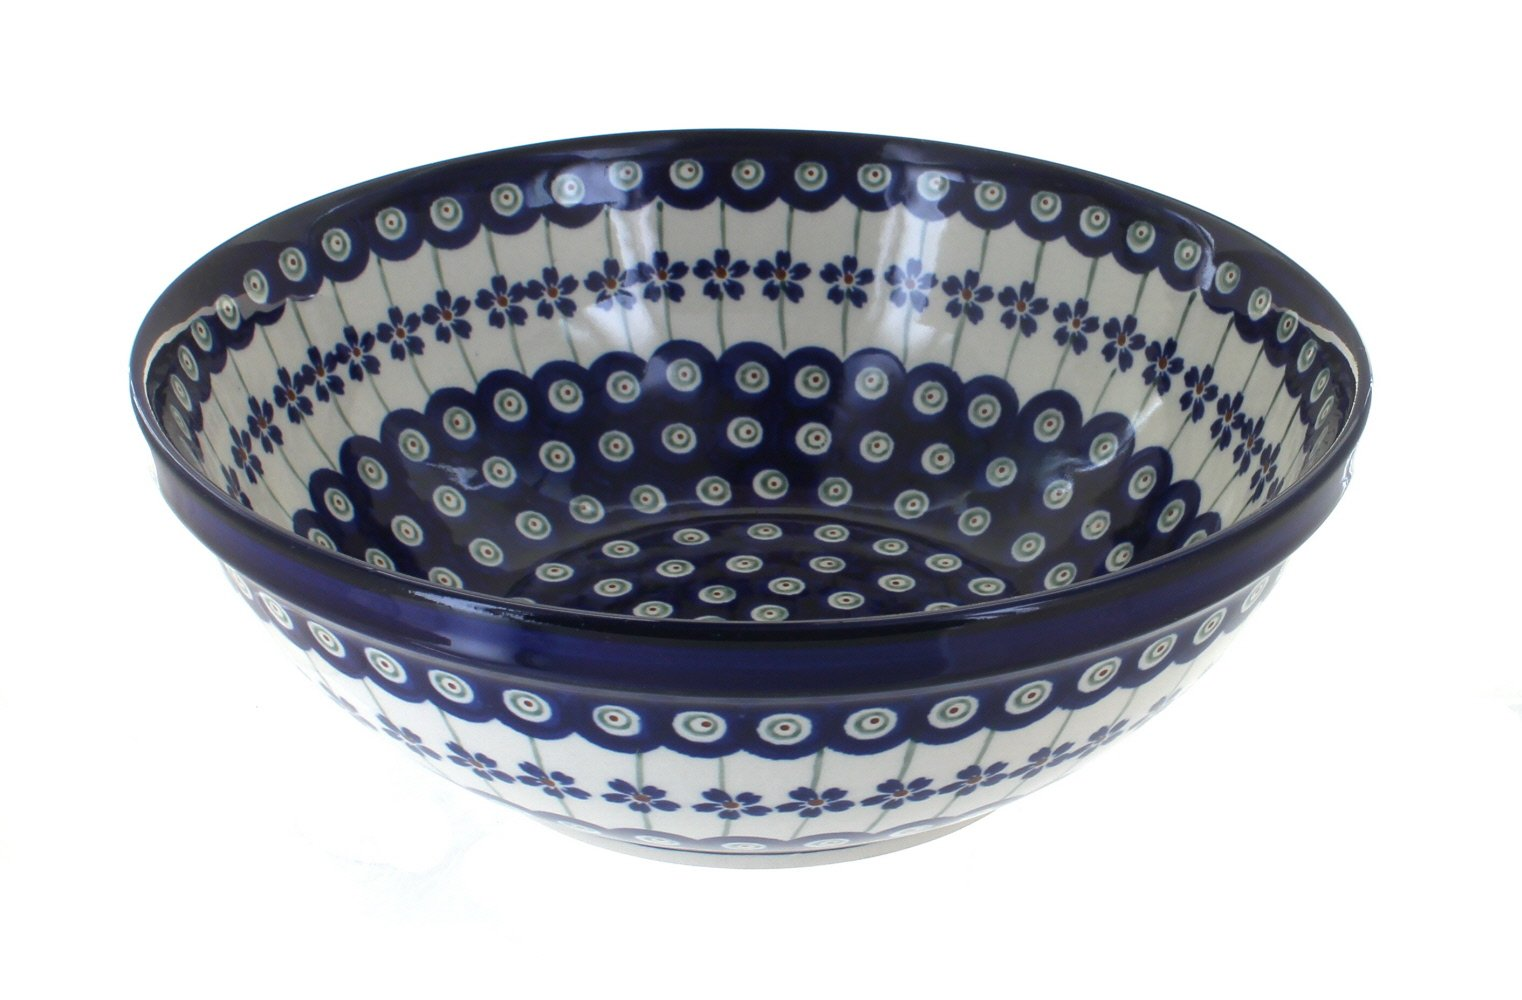 Polish Pottery Flowering Peacock Large Serving Bowl